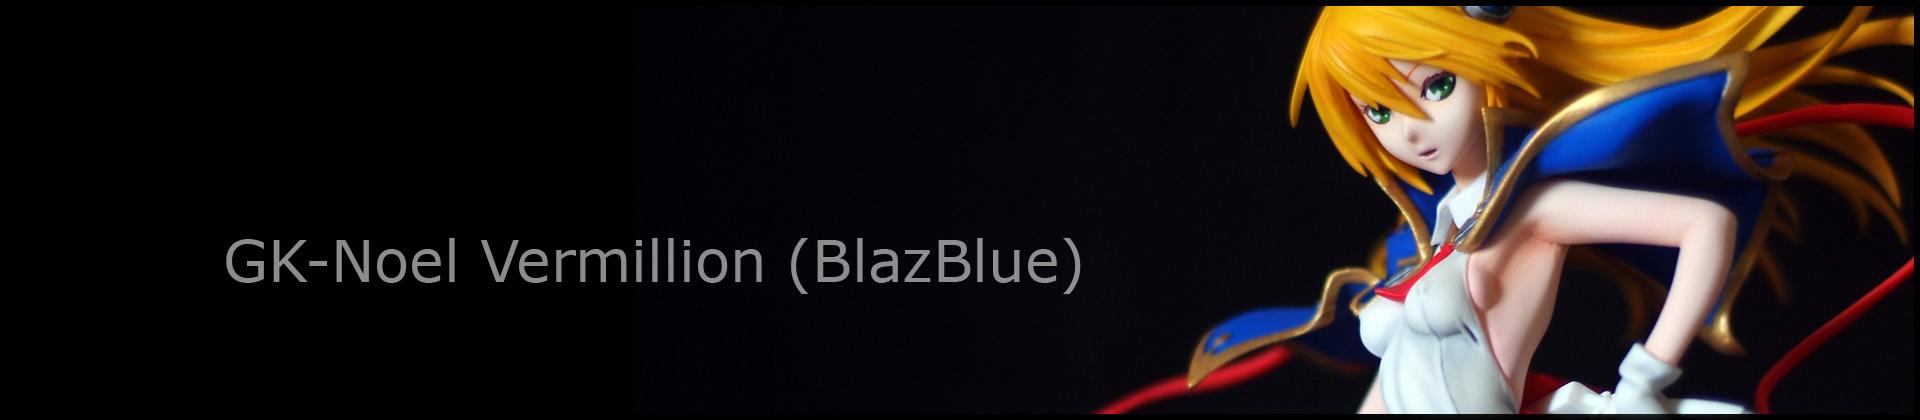 GK-Noel Vermillion (BlazBlue)